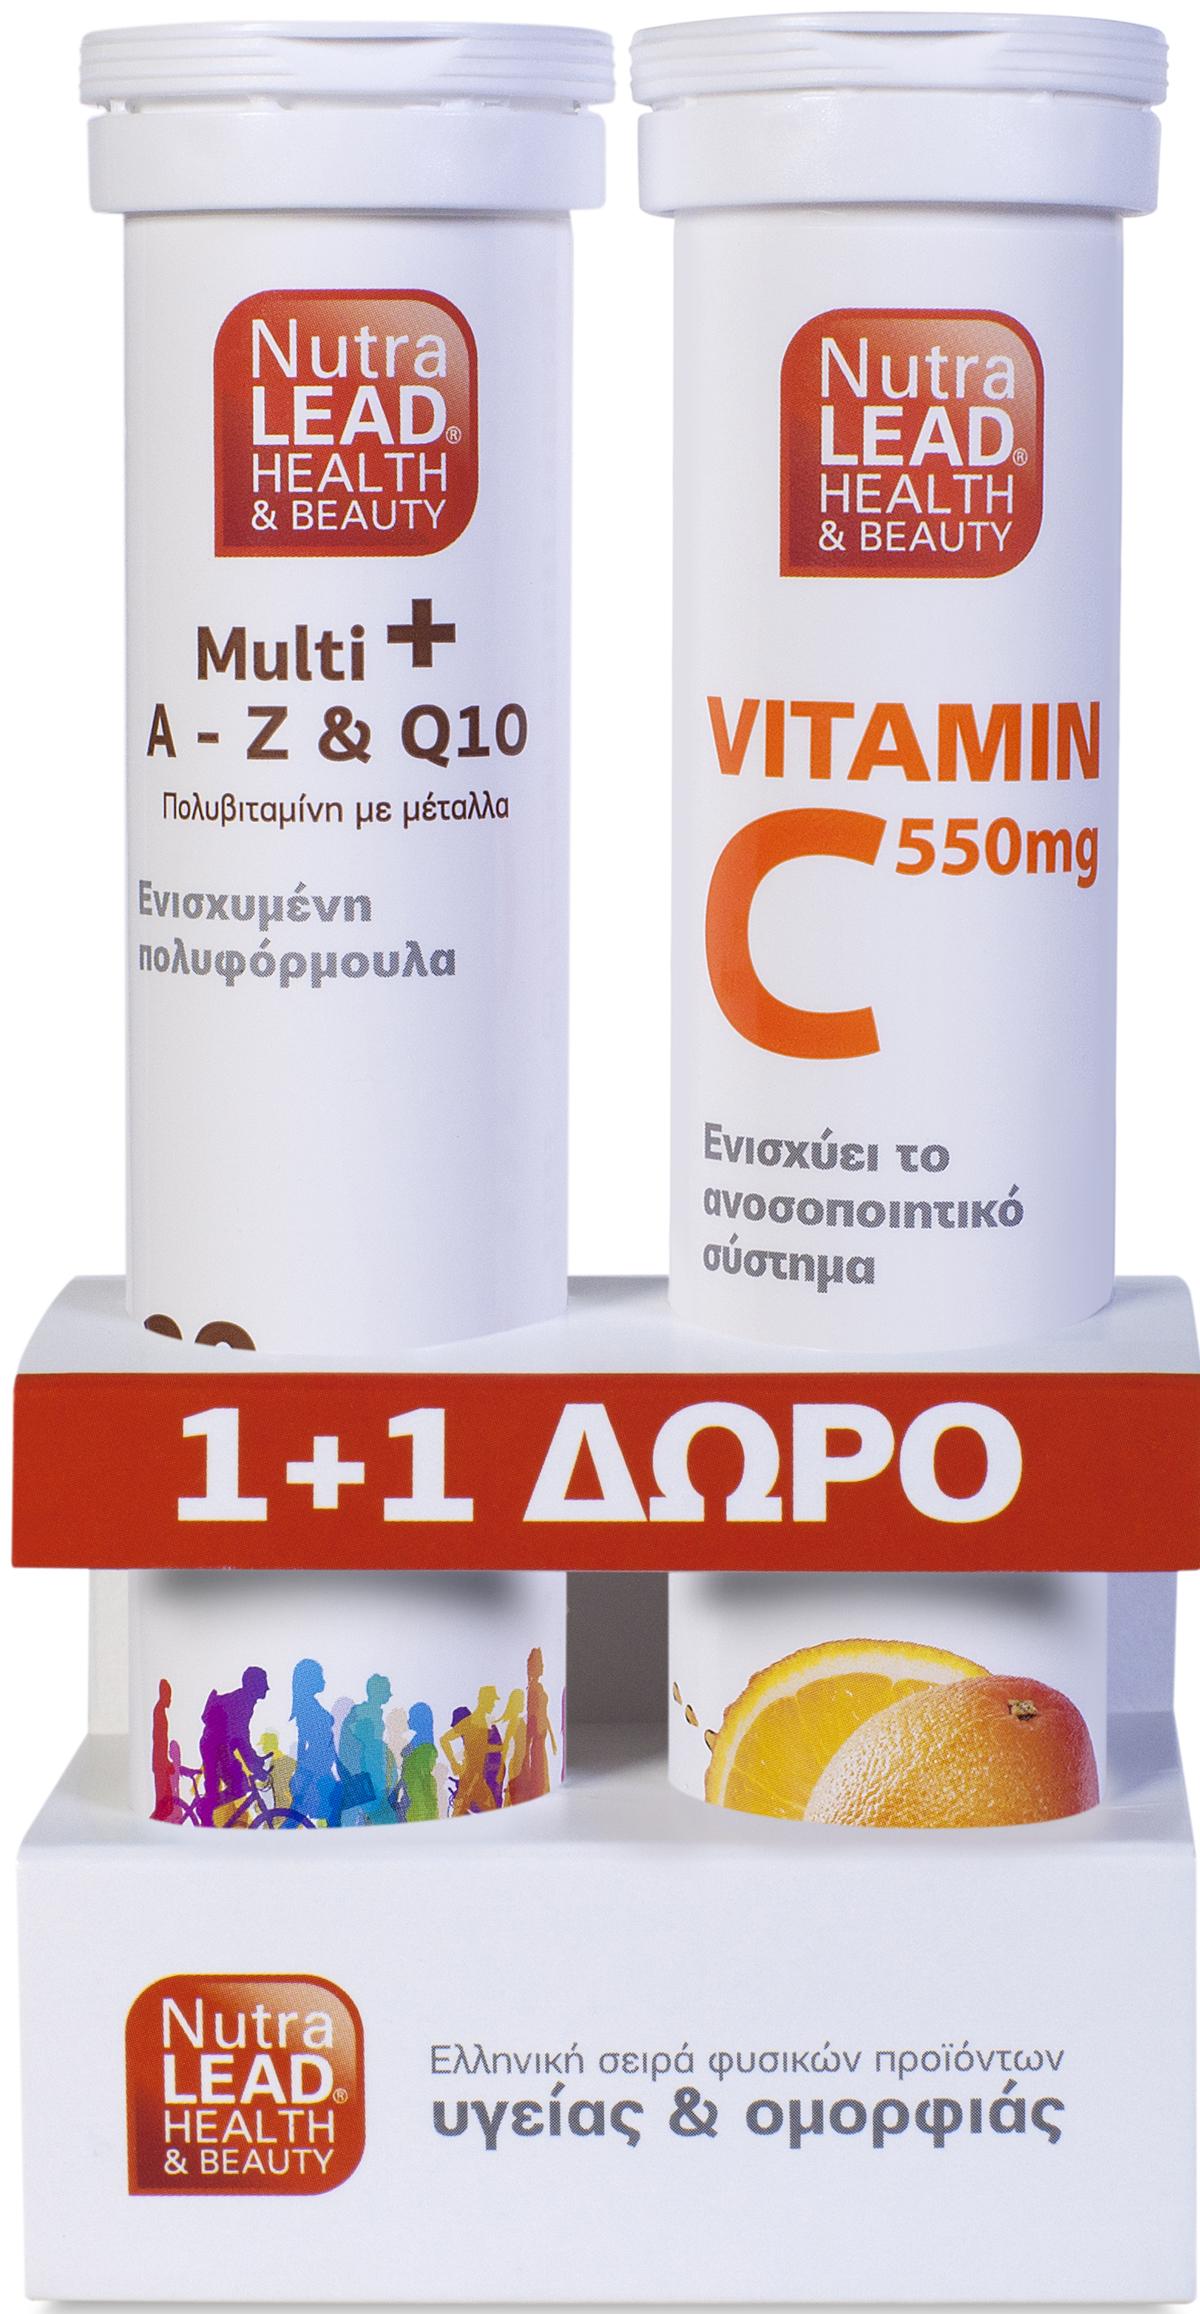 Nutralead Πακέτο Προσφοράς Multi+ A to Z & Q10 20Αναβρ.Δισκία + Βιταμίνη C 550mg – Πορτοκάλι 20Αναβρ.Δισκία